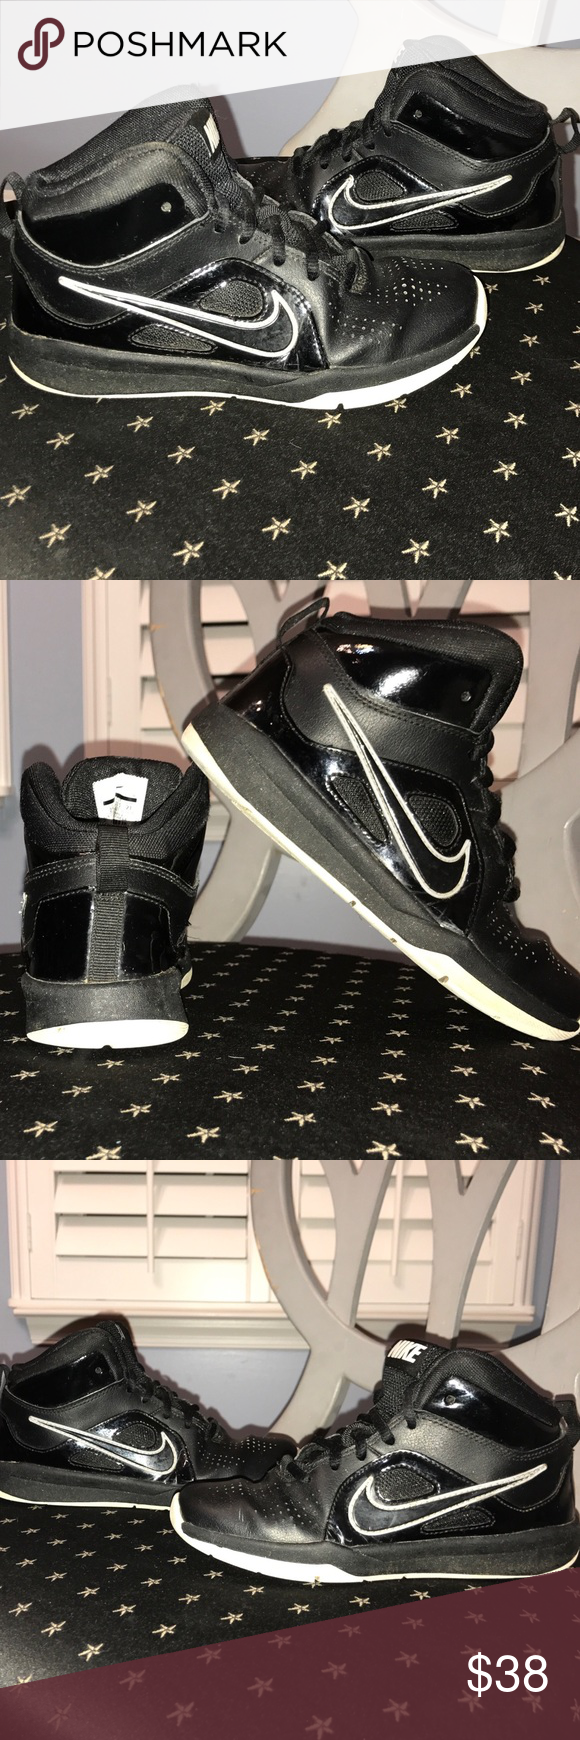 53b6670a85fd1 Nike Team Hustle D 6 Black/ White basketball shoes Nike Team Hustle ...